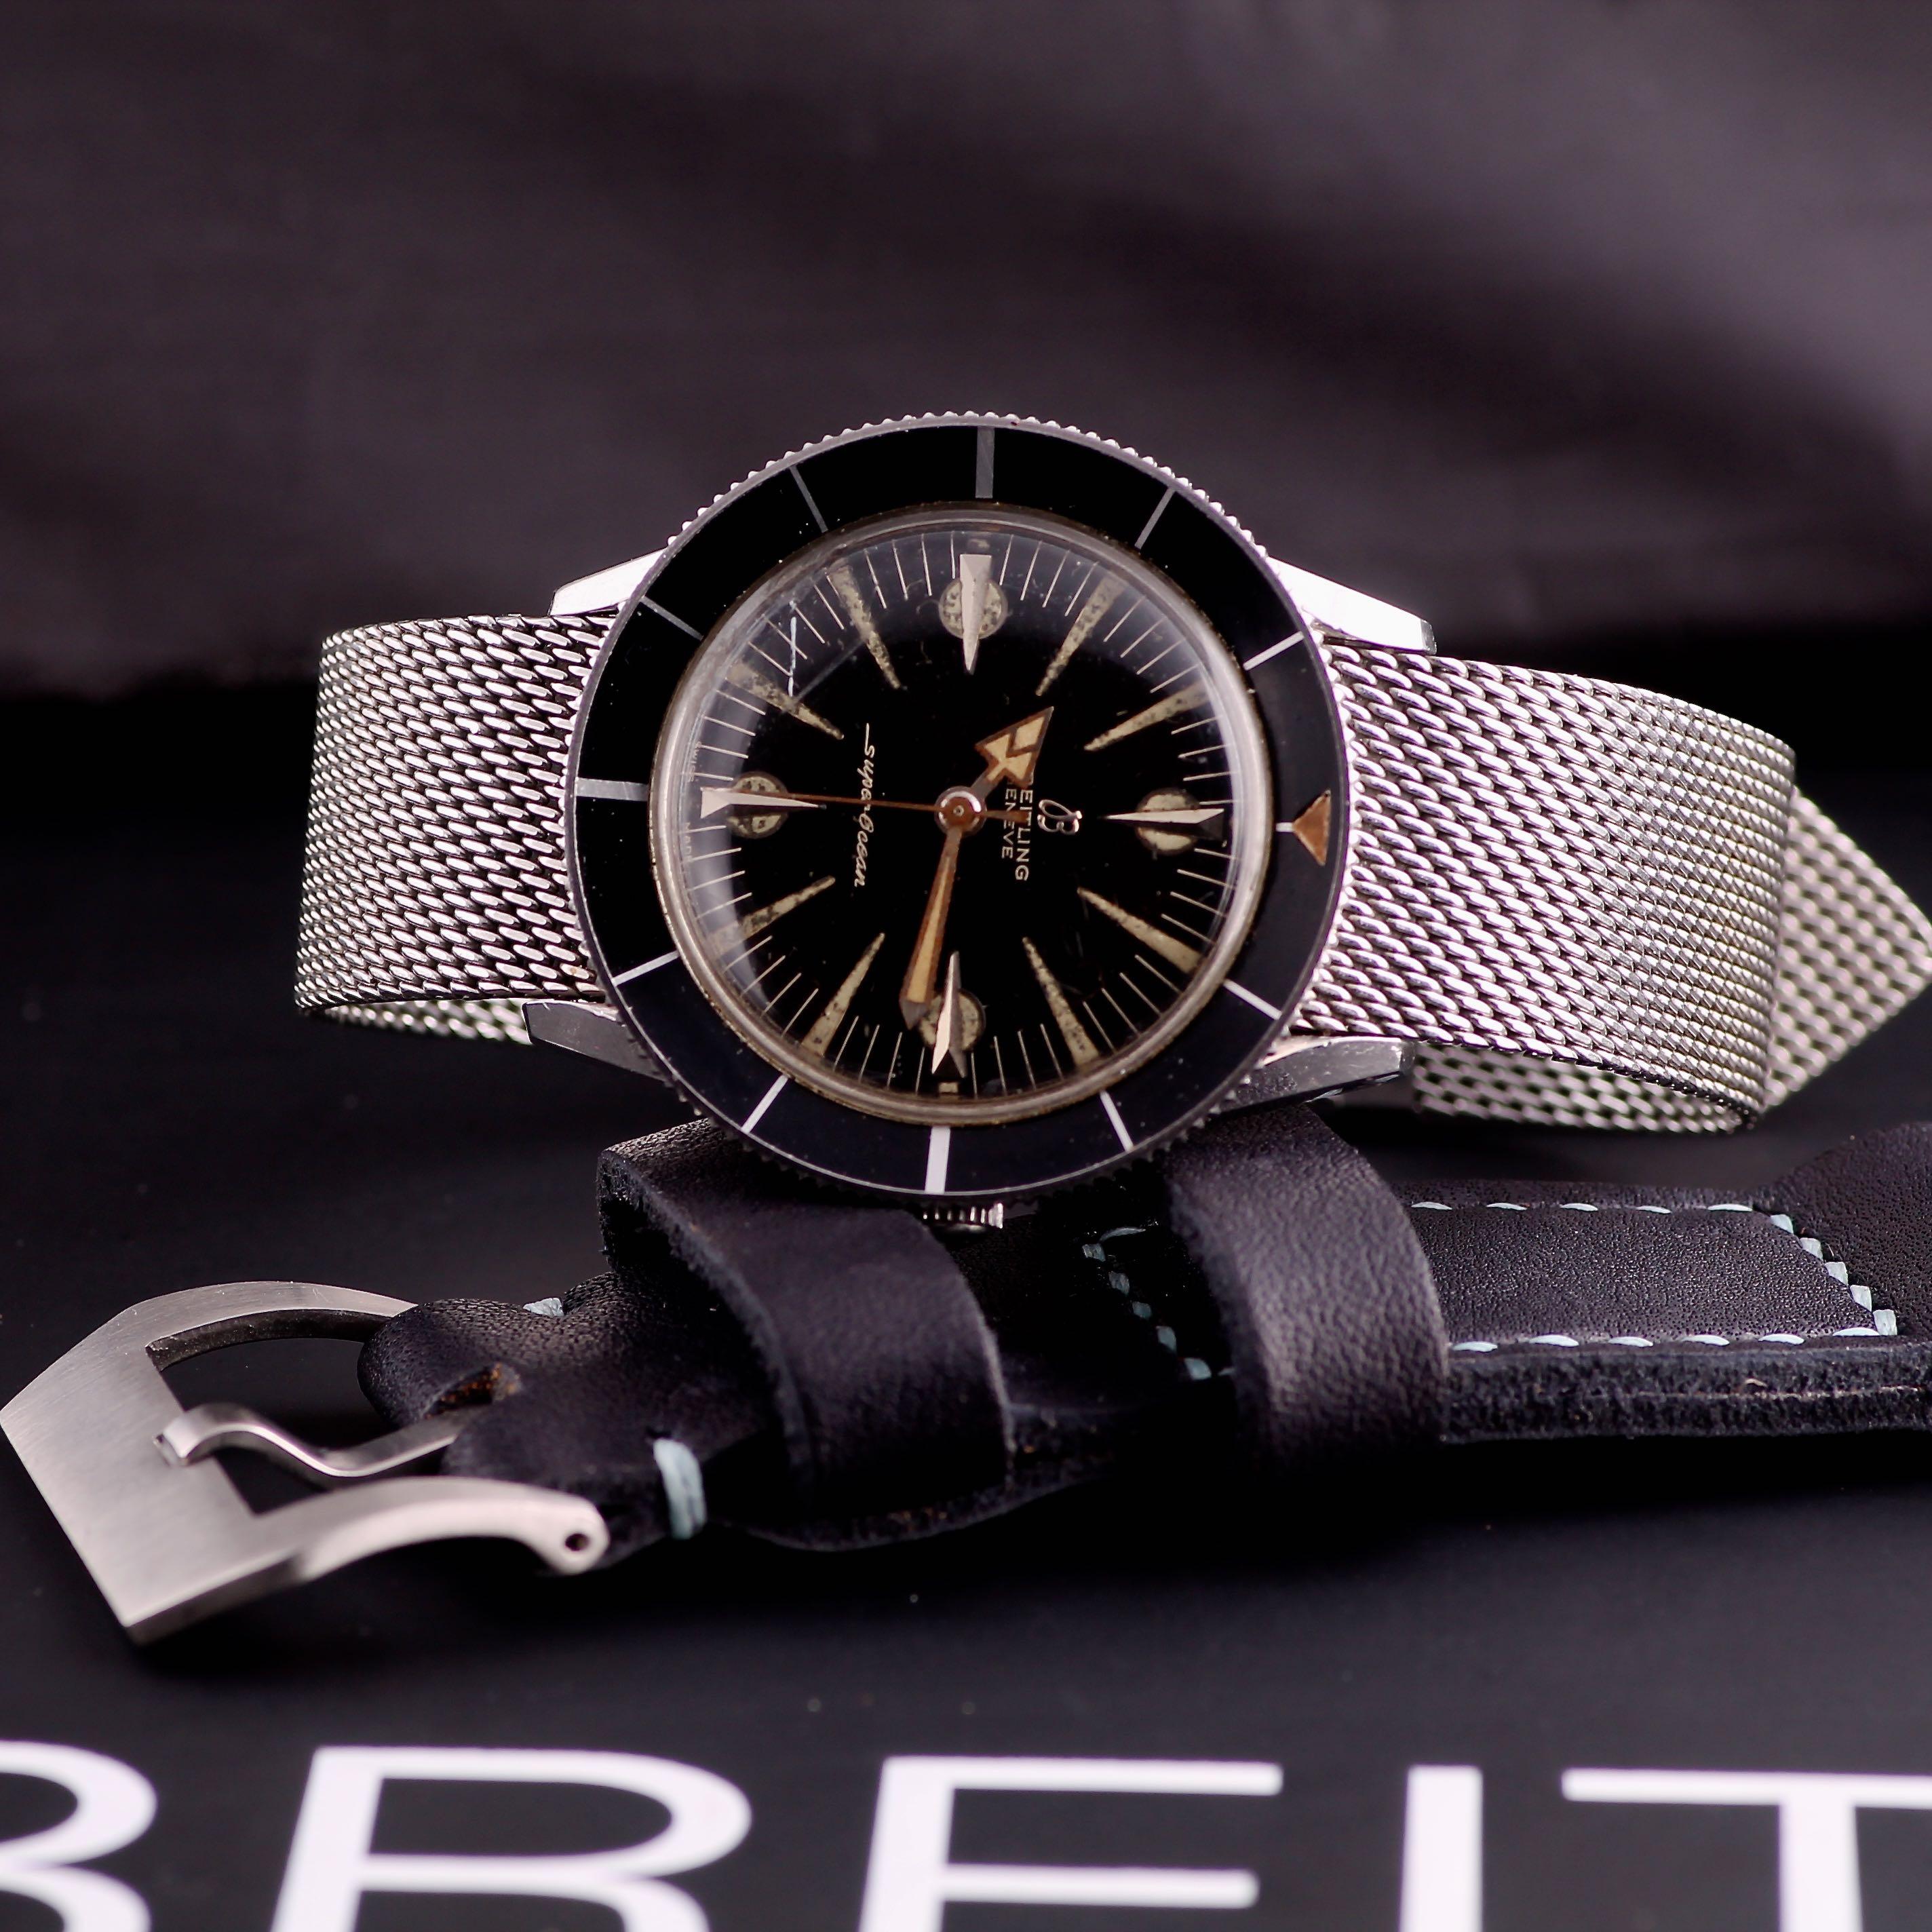 Breitling SuperOcean ref 1004 1959